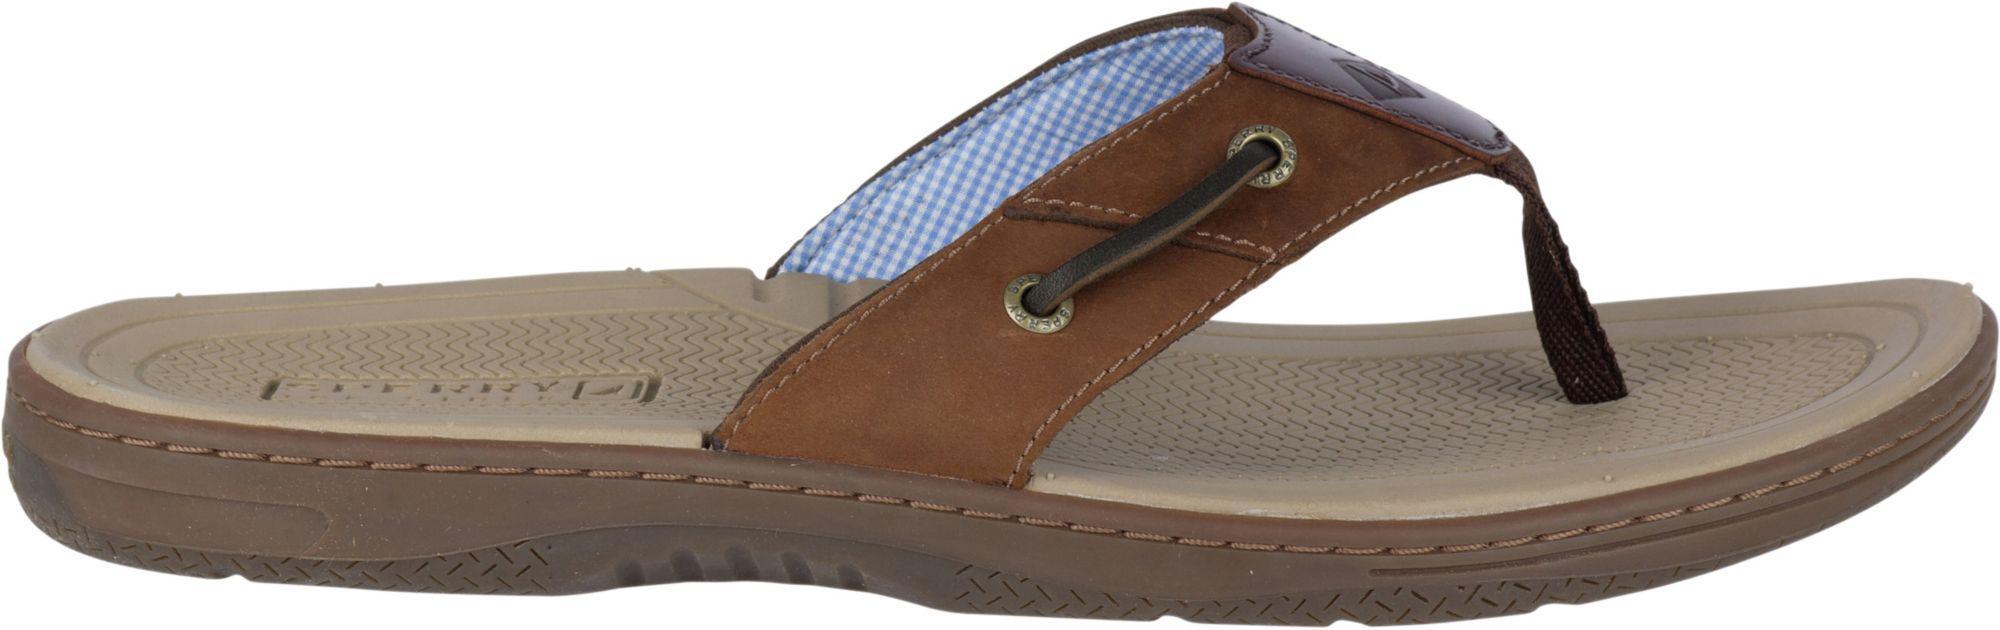 729954e7c46 Lyst - Sperry Top-Sider Sperry Baitfish Flip Flops in Brown for Men